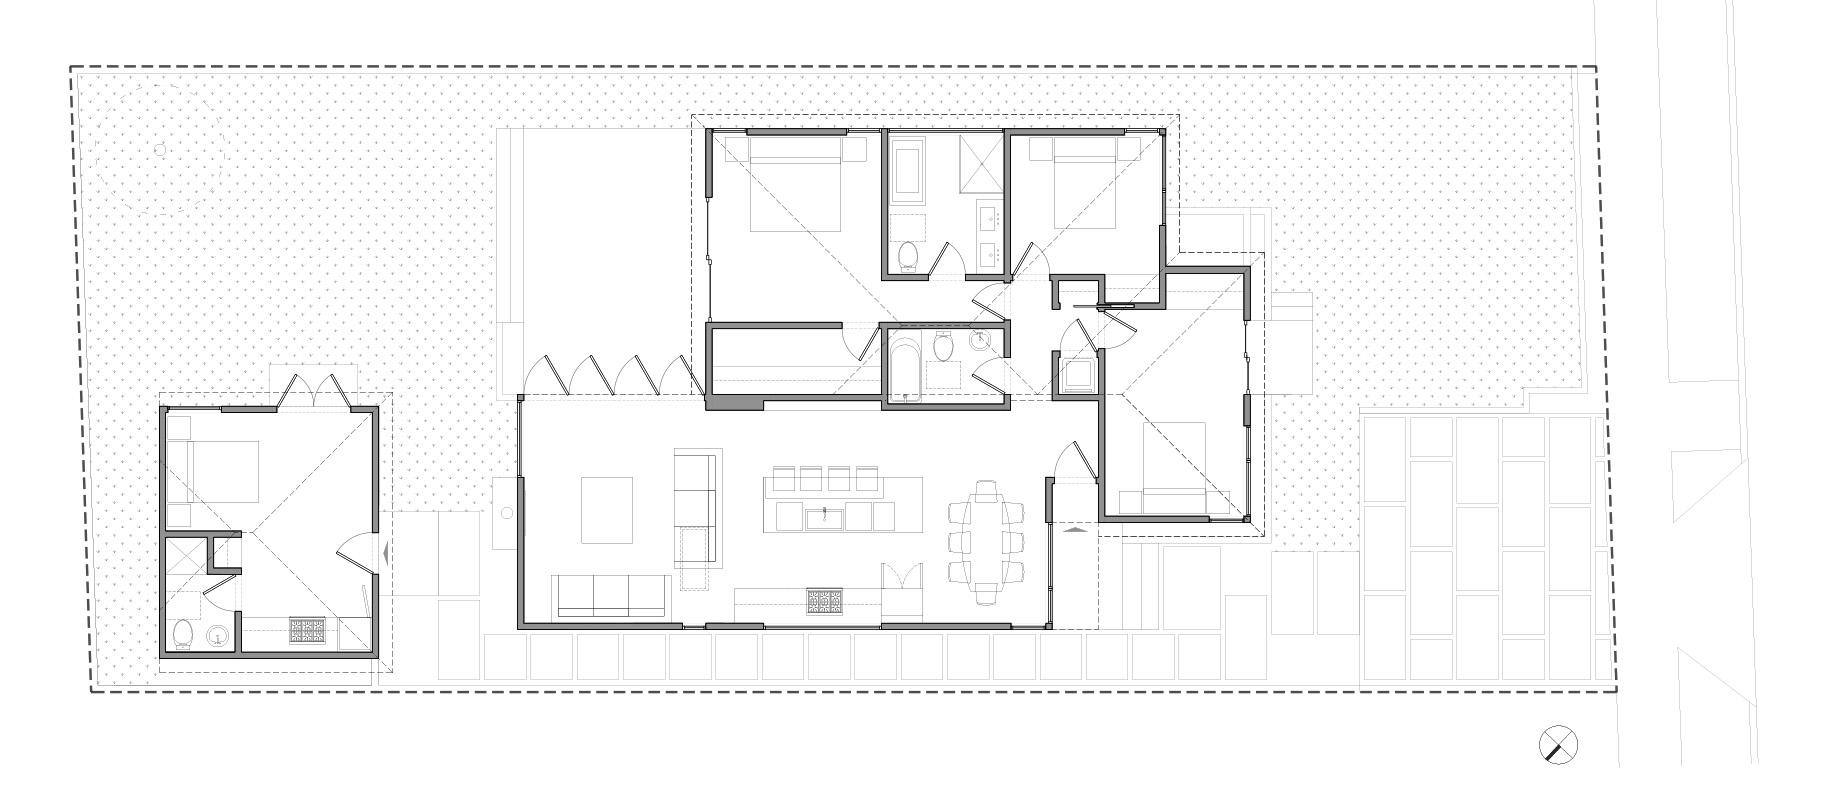 Finished plan of remodel/addition/garage conversion